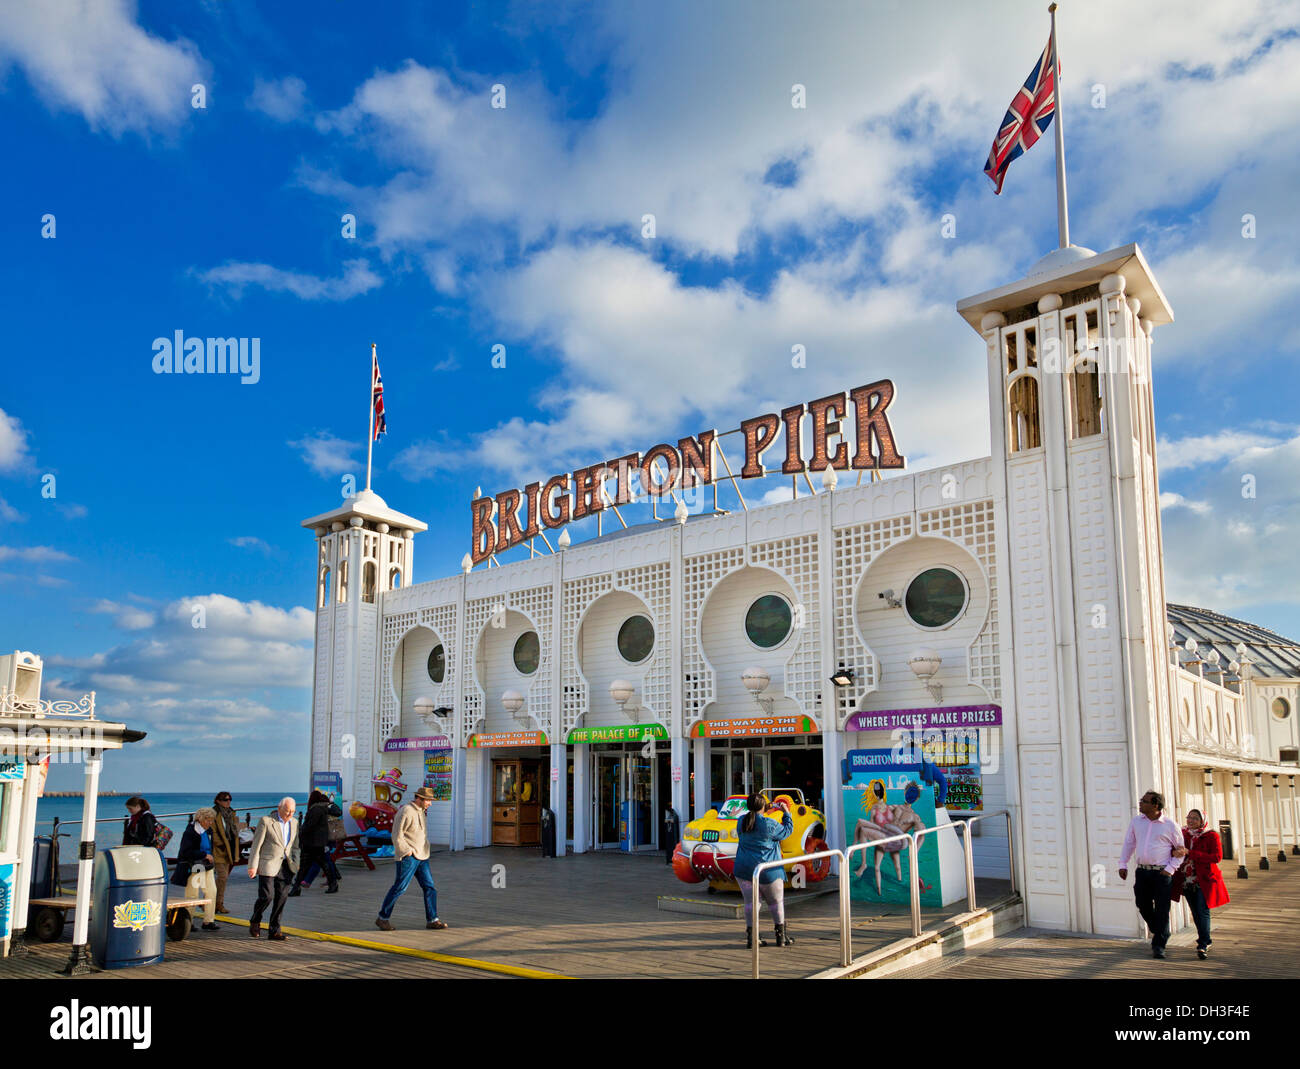 Brighton pier brighton palace pier brighton west sussex england uk gb eu europe - Stock Image